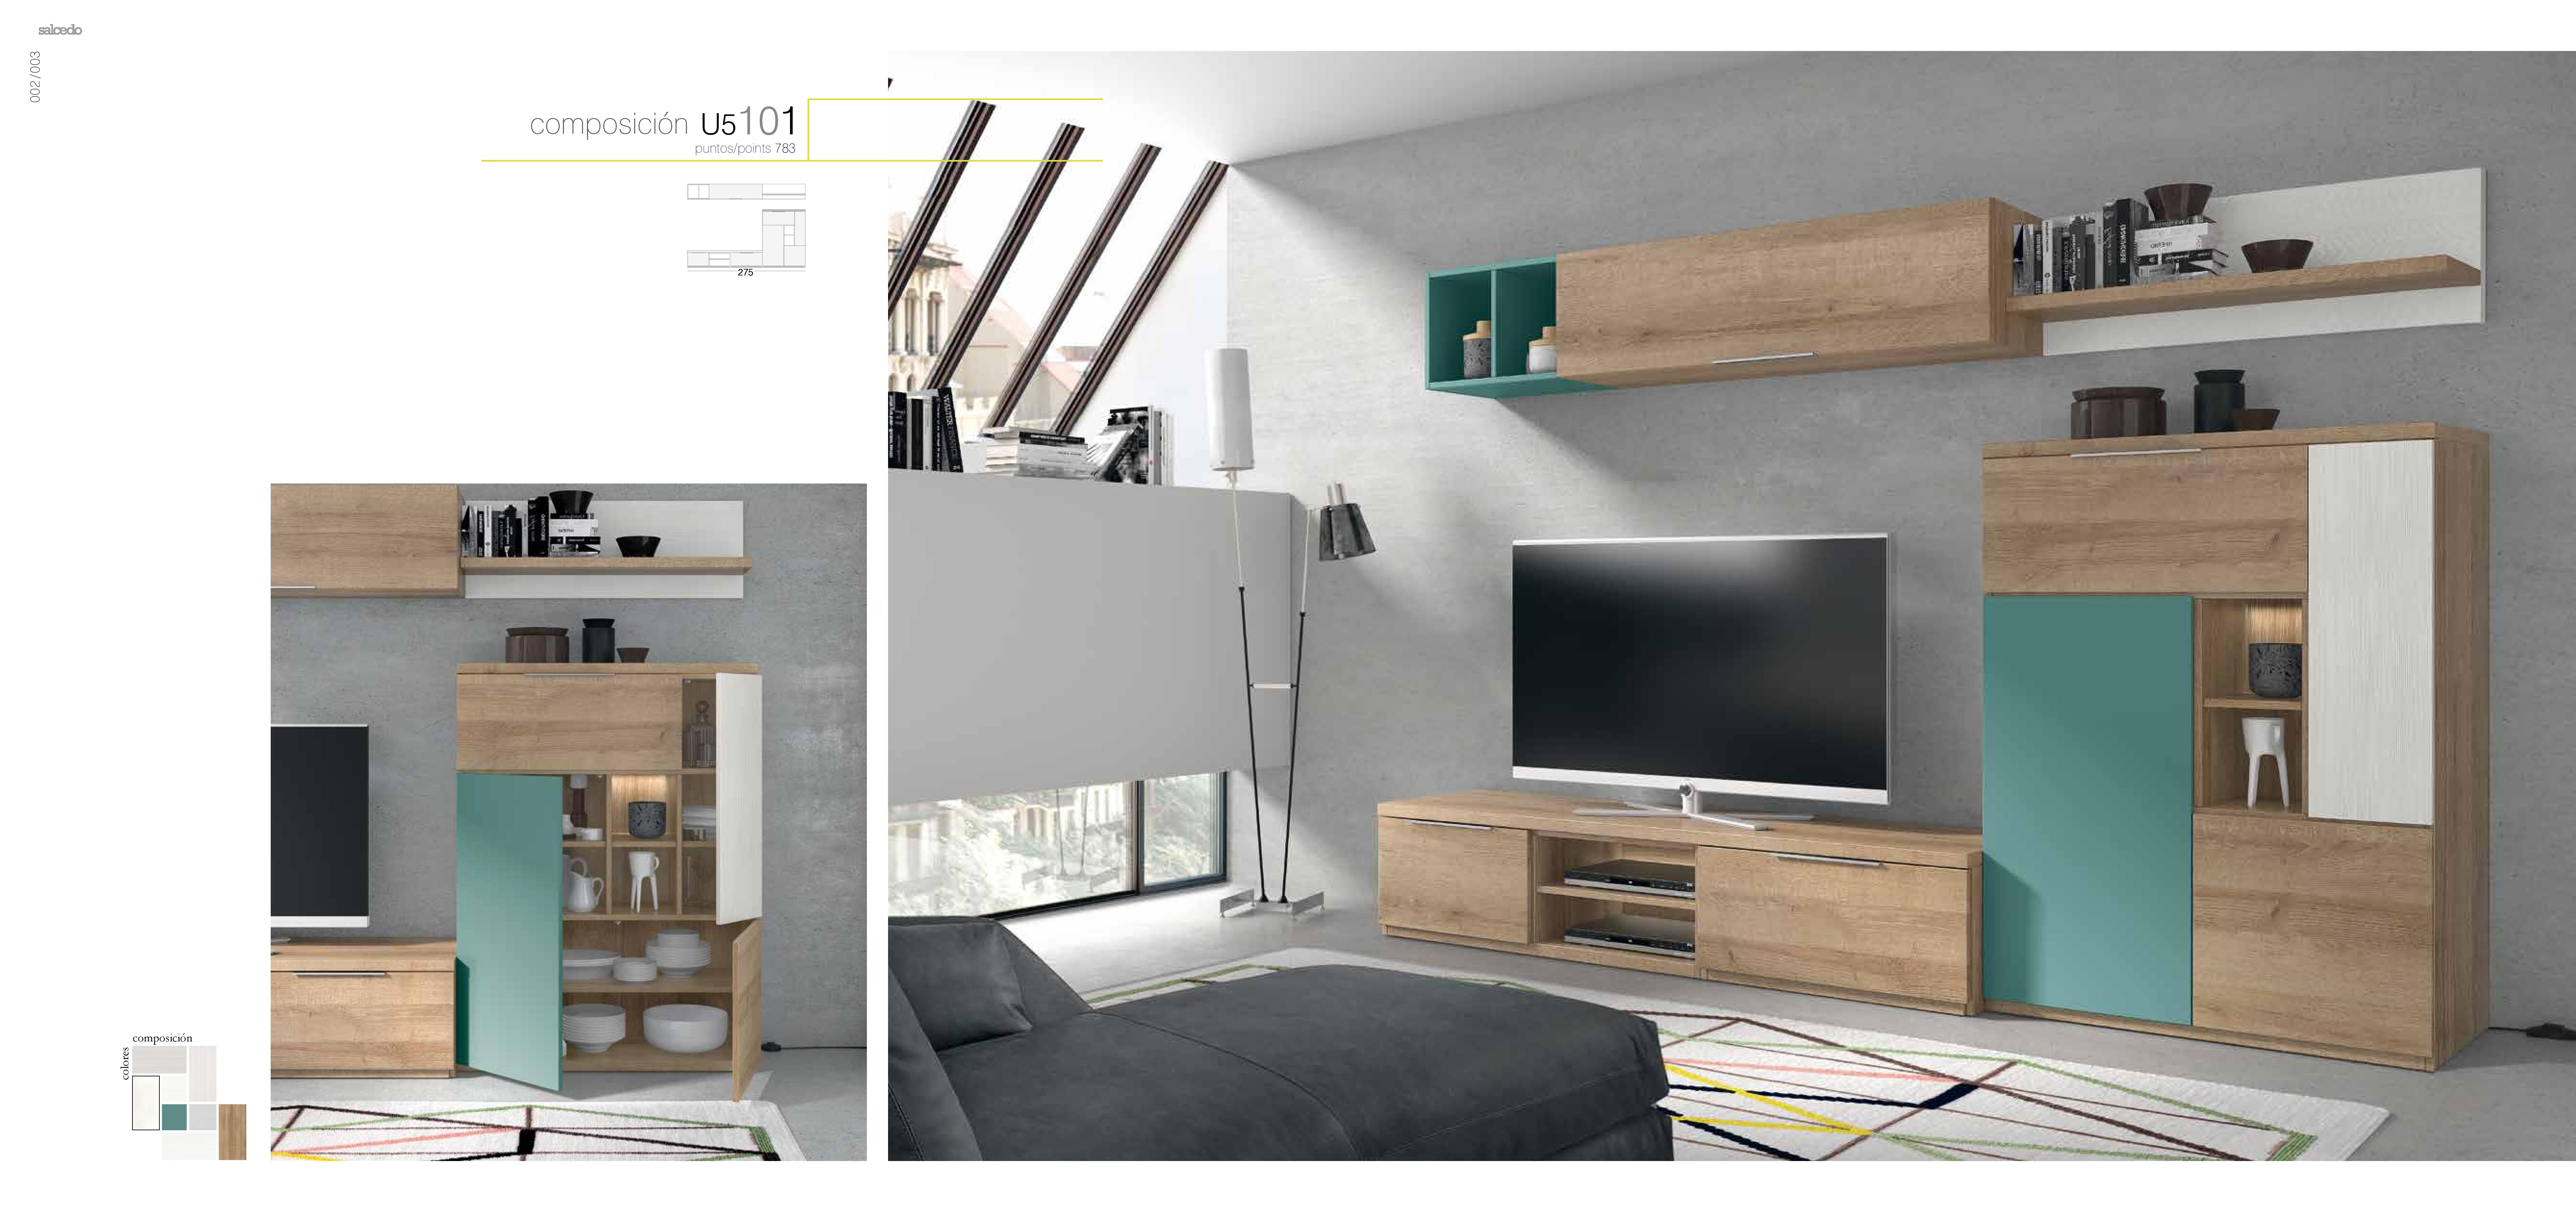 salcedo s jour salon salle manger meubles canap s chezsoidesign st cyr sur mer. Black Bedroom Furniture Sets. Home Design Ideas